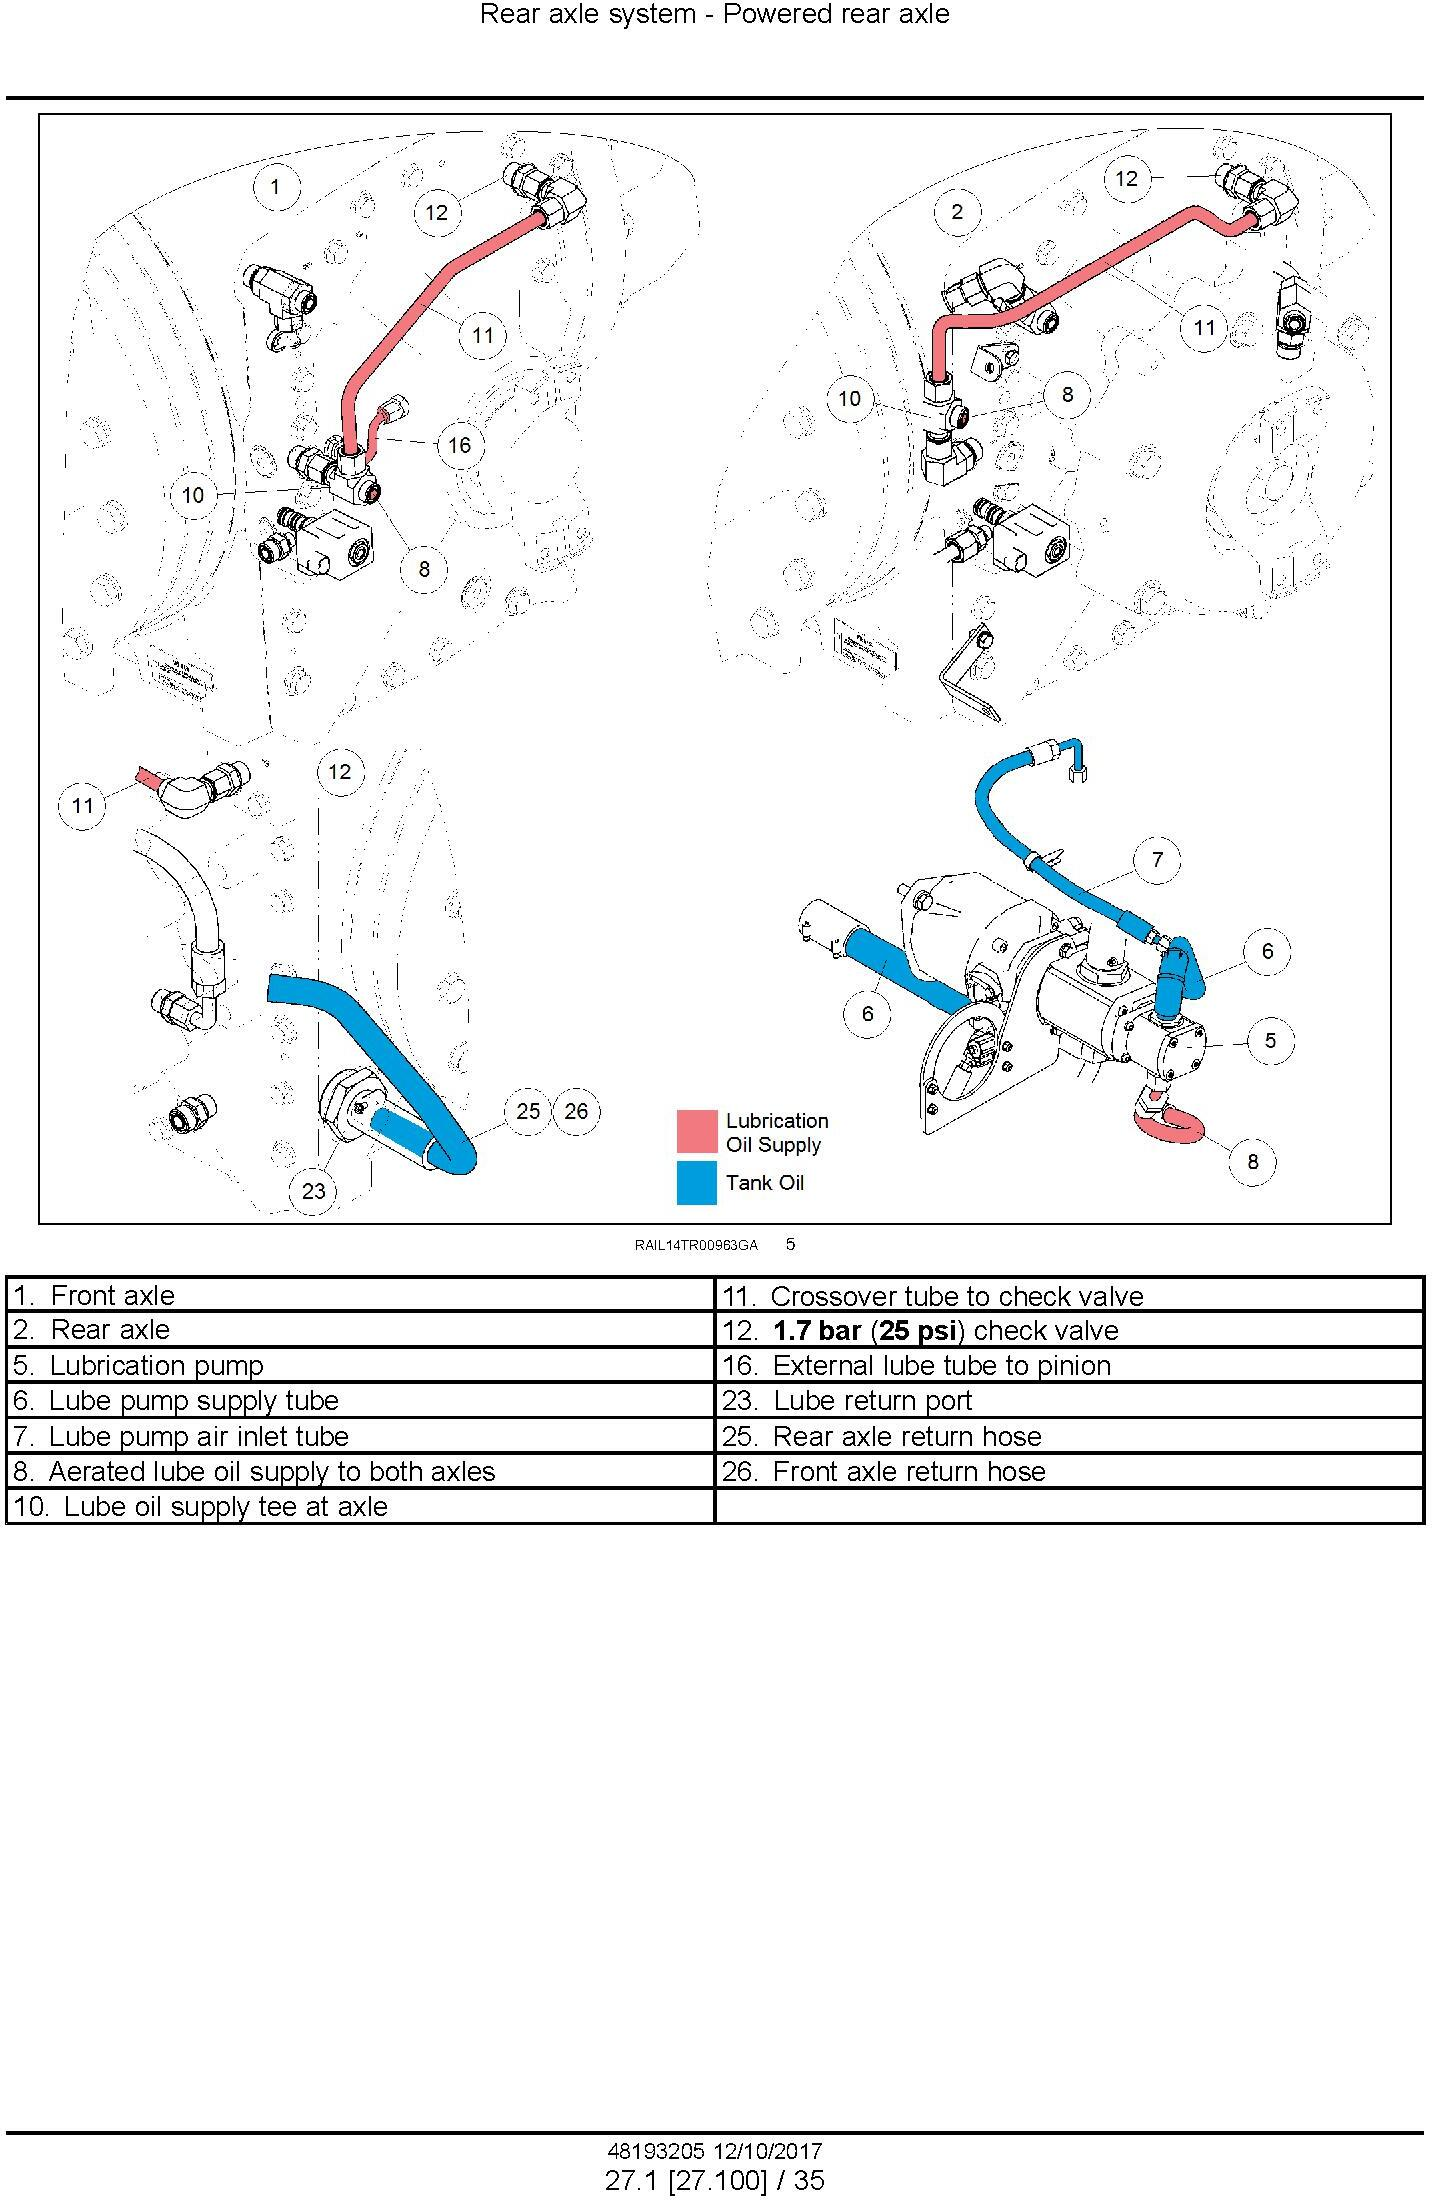 New Holland T9.435, T9.480, T9.530, T9.565, T9.600, T9.645, T9.700 Tier4B fin Tractor Service Manual - 1